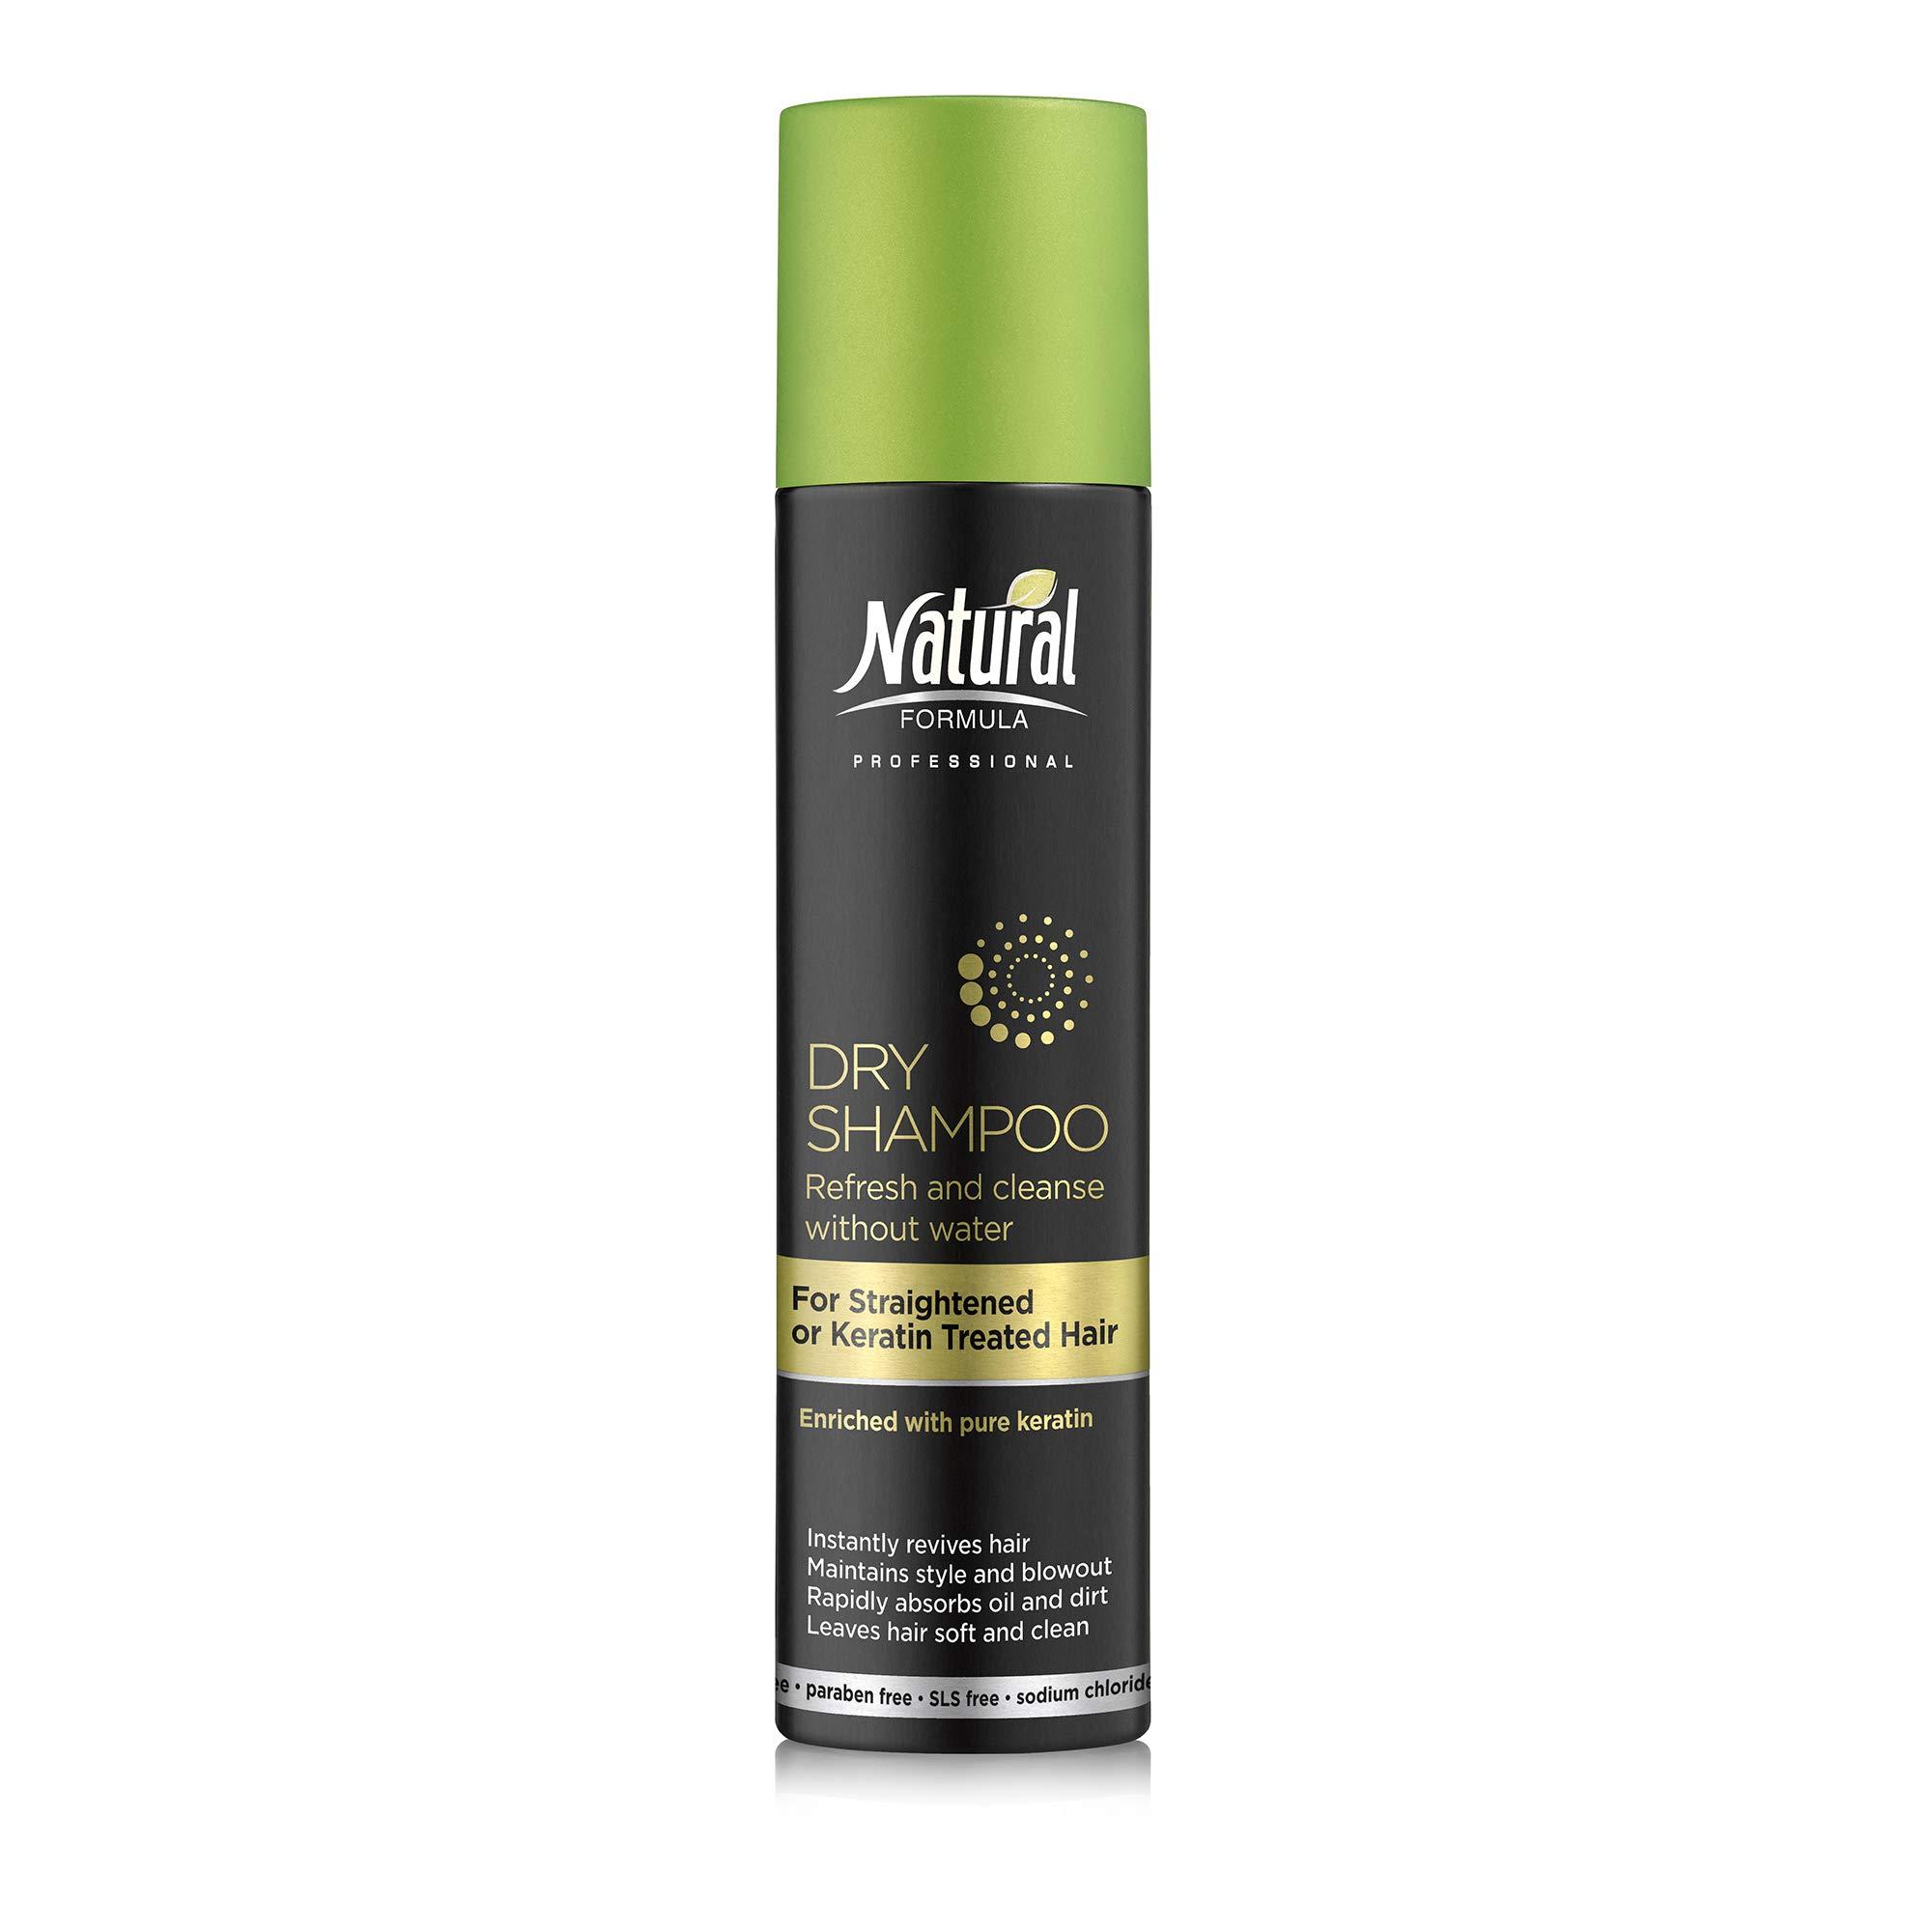 Natural Formula Dry Shampoo for Straightened, Heat Styled or Keratin Treated Hair – Keratin Infused Dry Shampoo Hair Spray – Sodium Chloride Salt, Talc, SLS and Paraben Free 6.76 Fl Oz